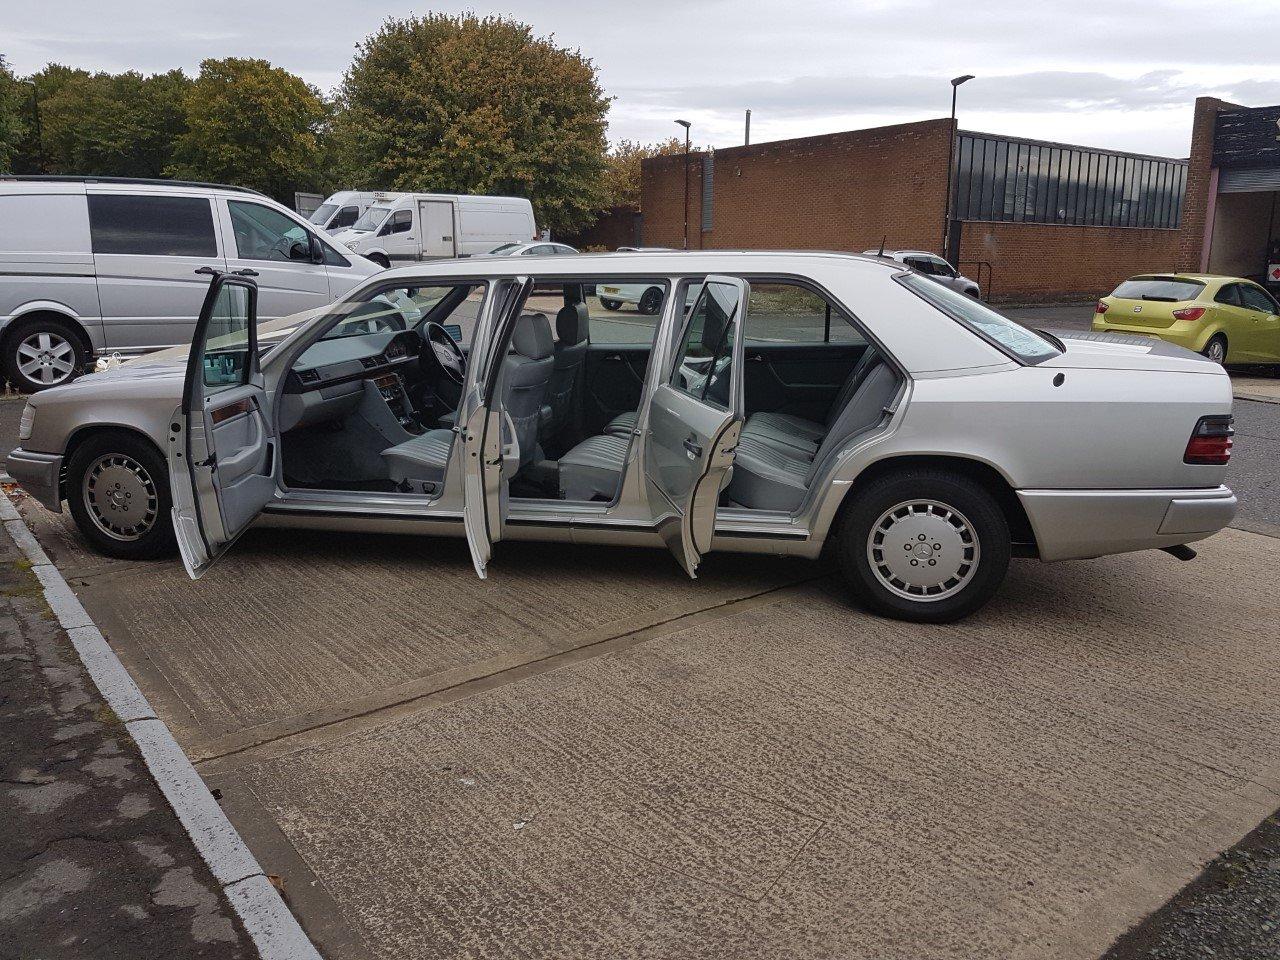 1992 Mercedes 6 door limousine For Sale (picture 6 of 6)